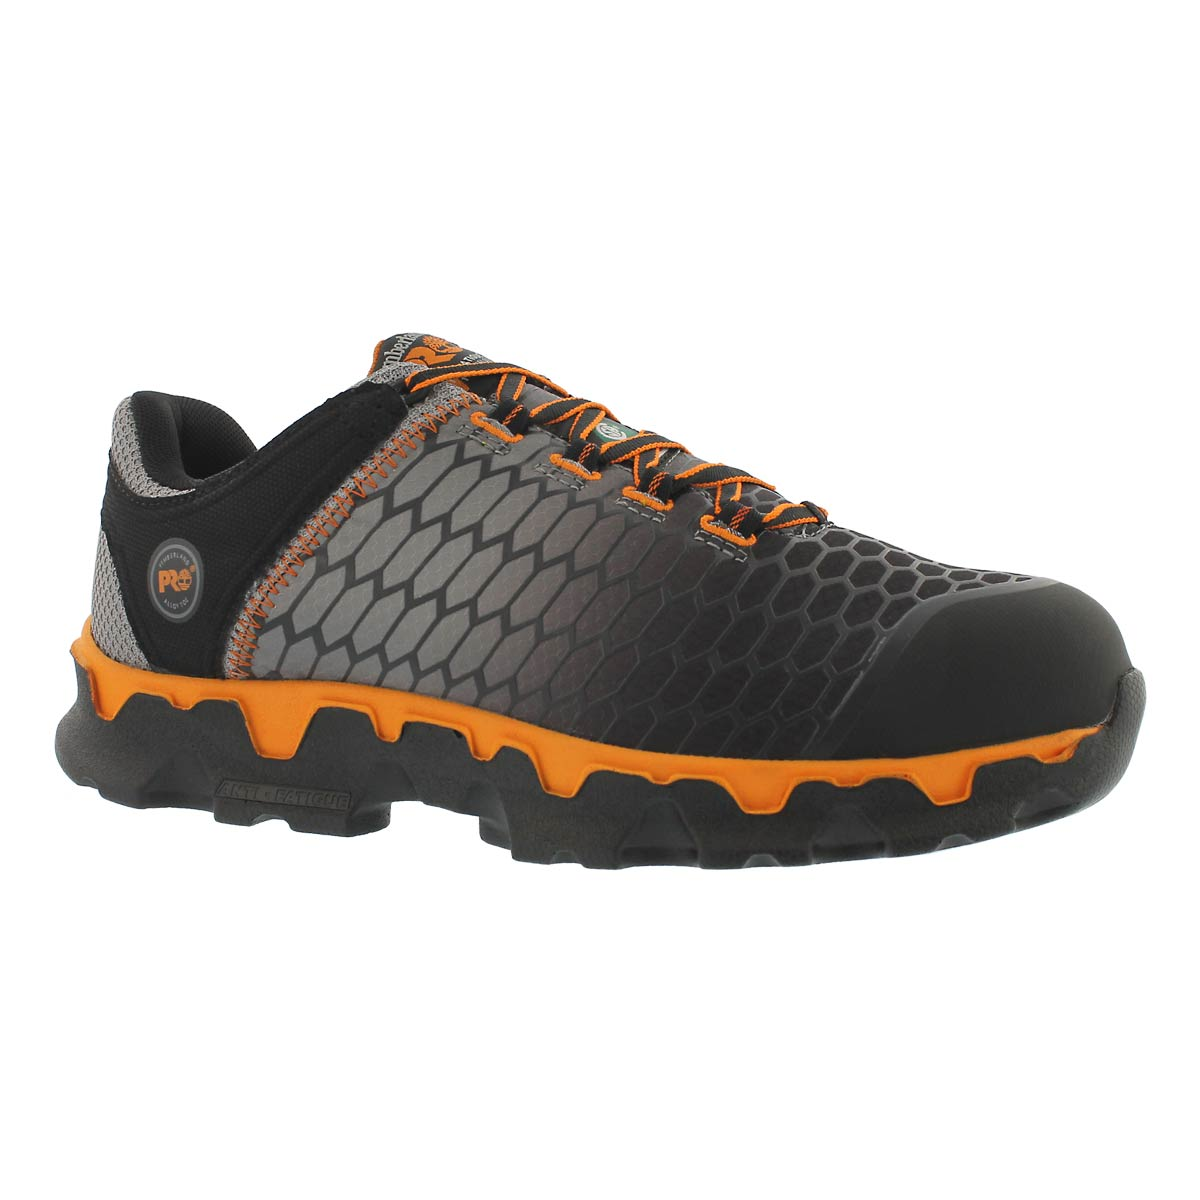 Men's POWERTRAIN SPORT grey/orange CSA sneakers